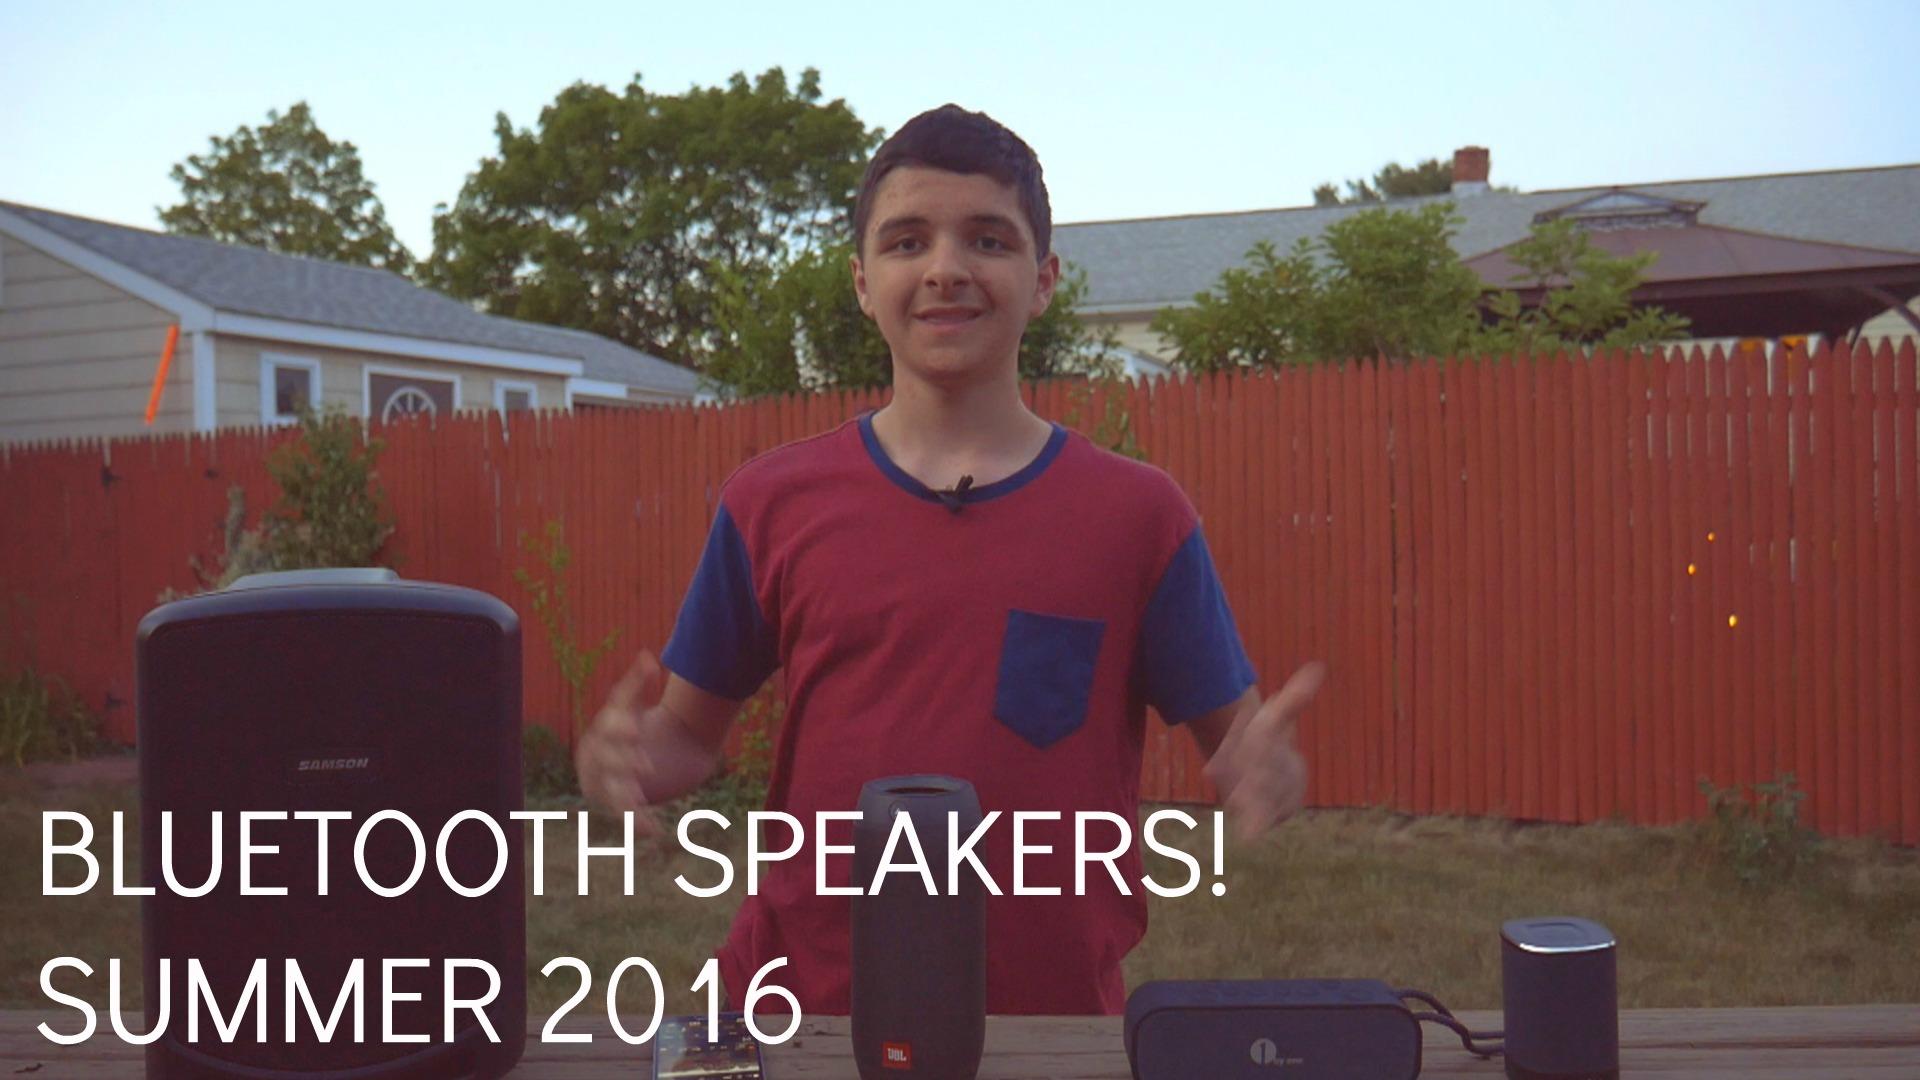 bluetooth summer 2016